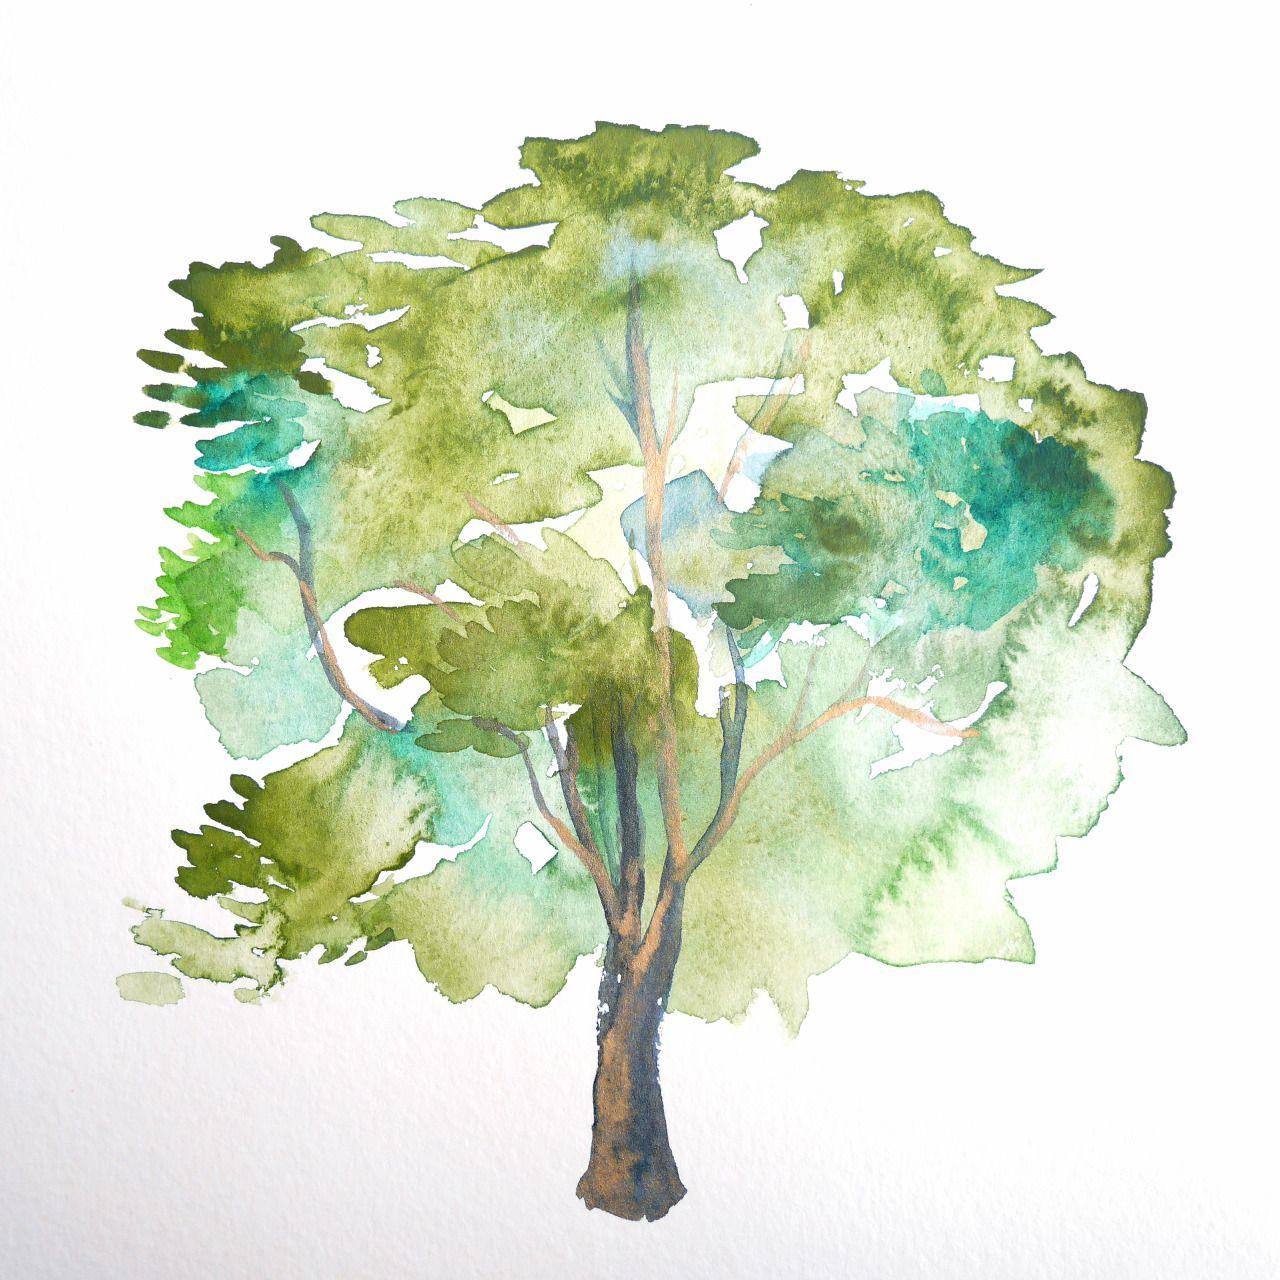 watercolor trees - Google Search | кусты и деревья | Pinterest ...